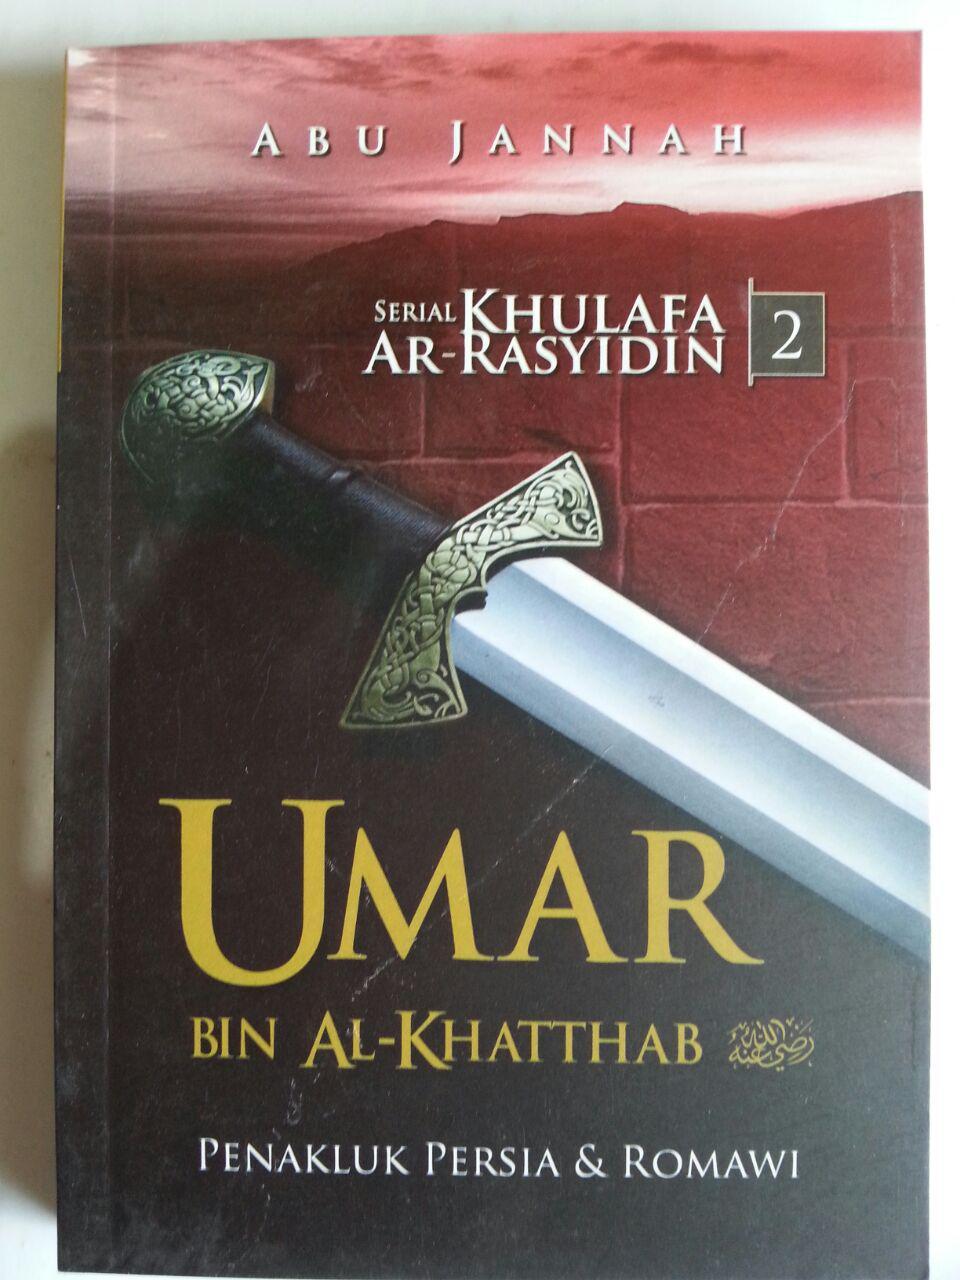 Buku Serial Khulafa Ar-Rasyidin 1 Set 4 Jilid cover 4